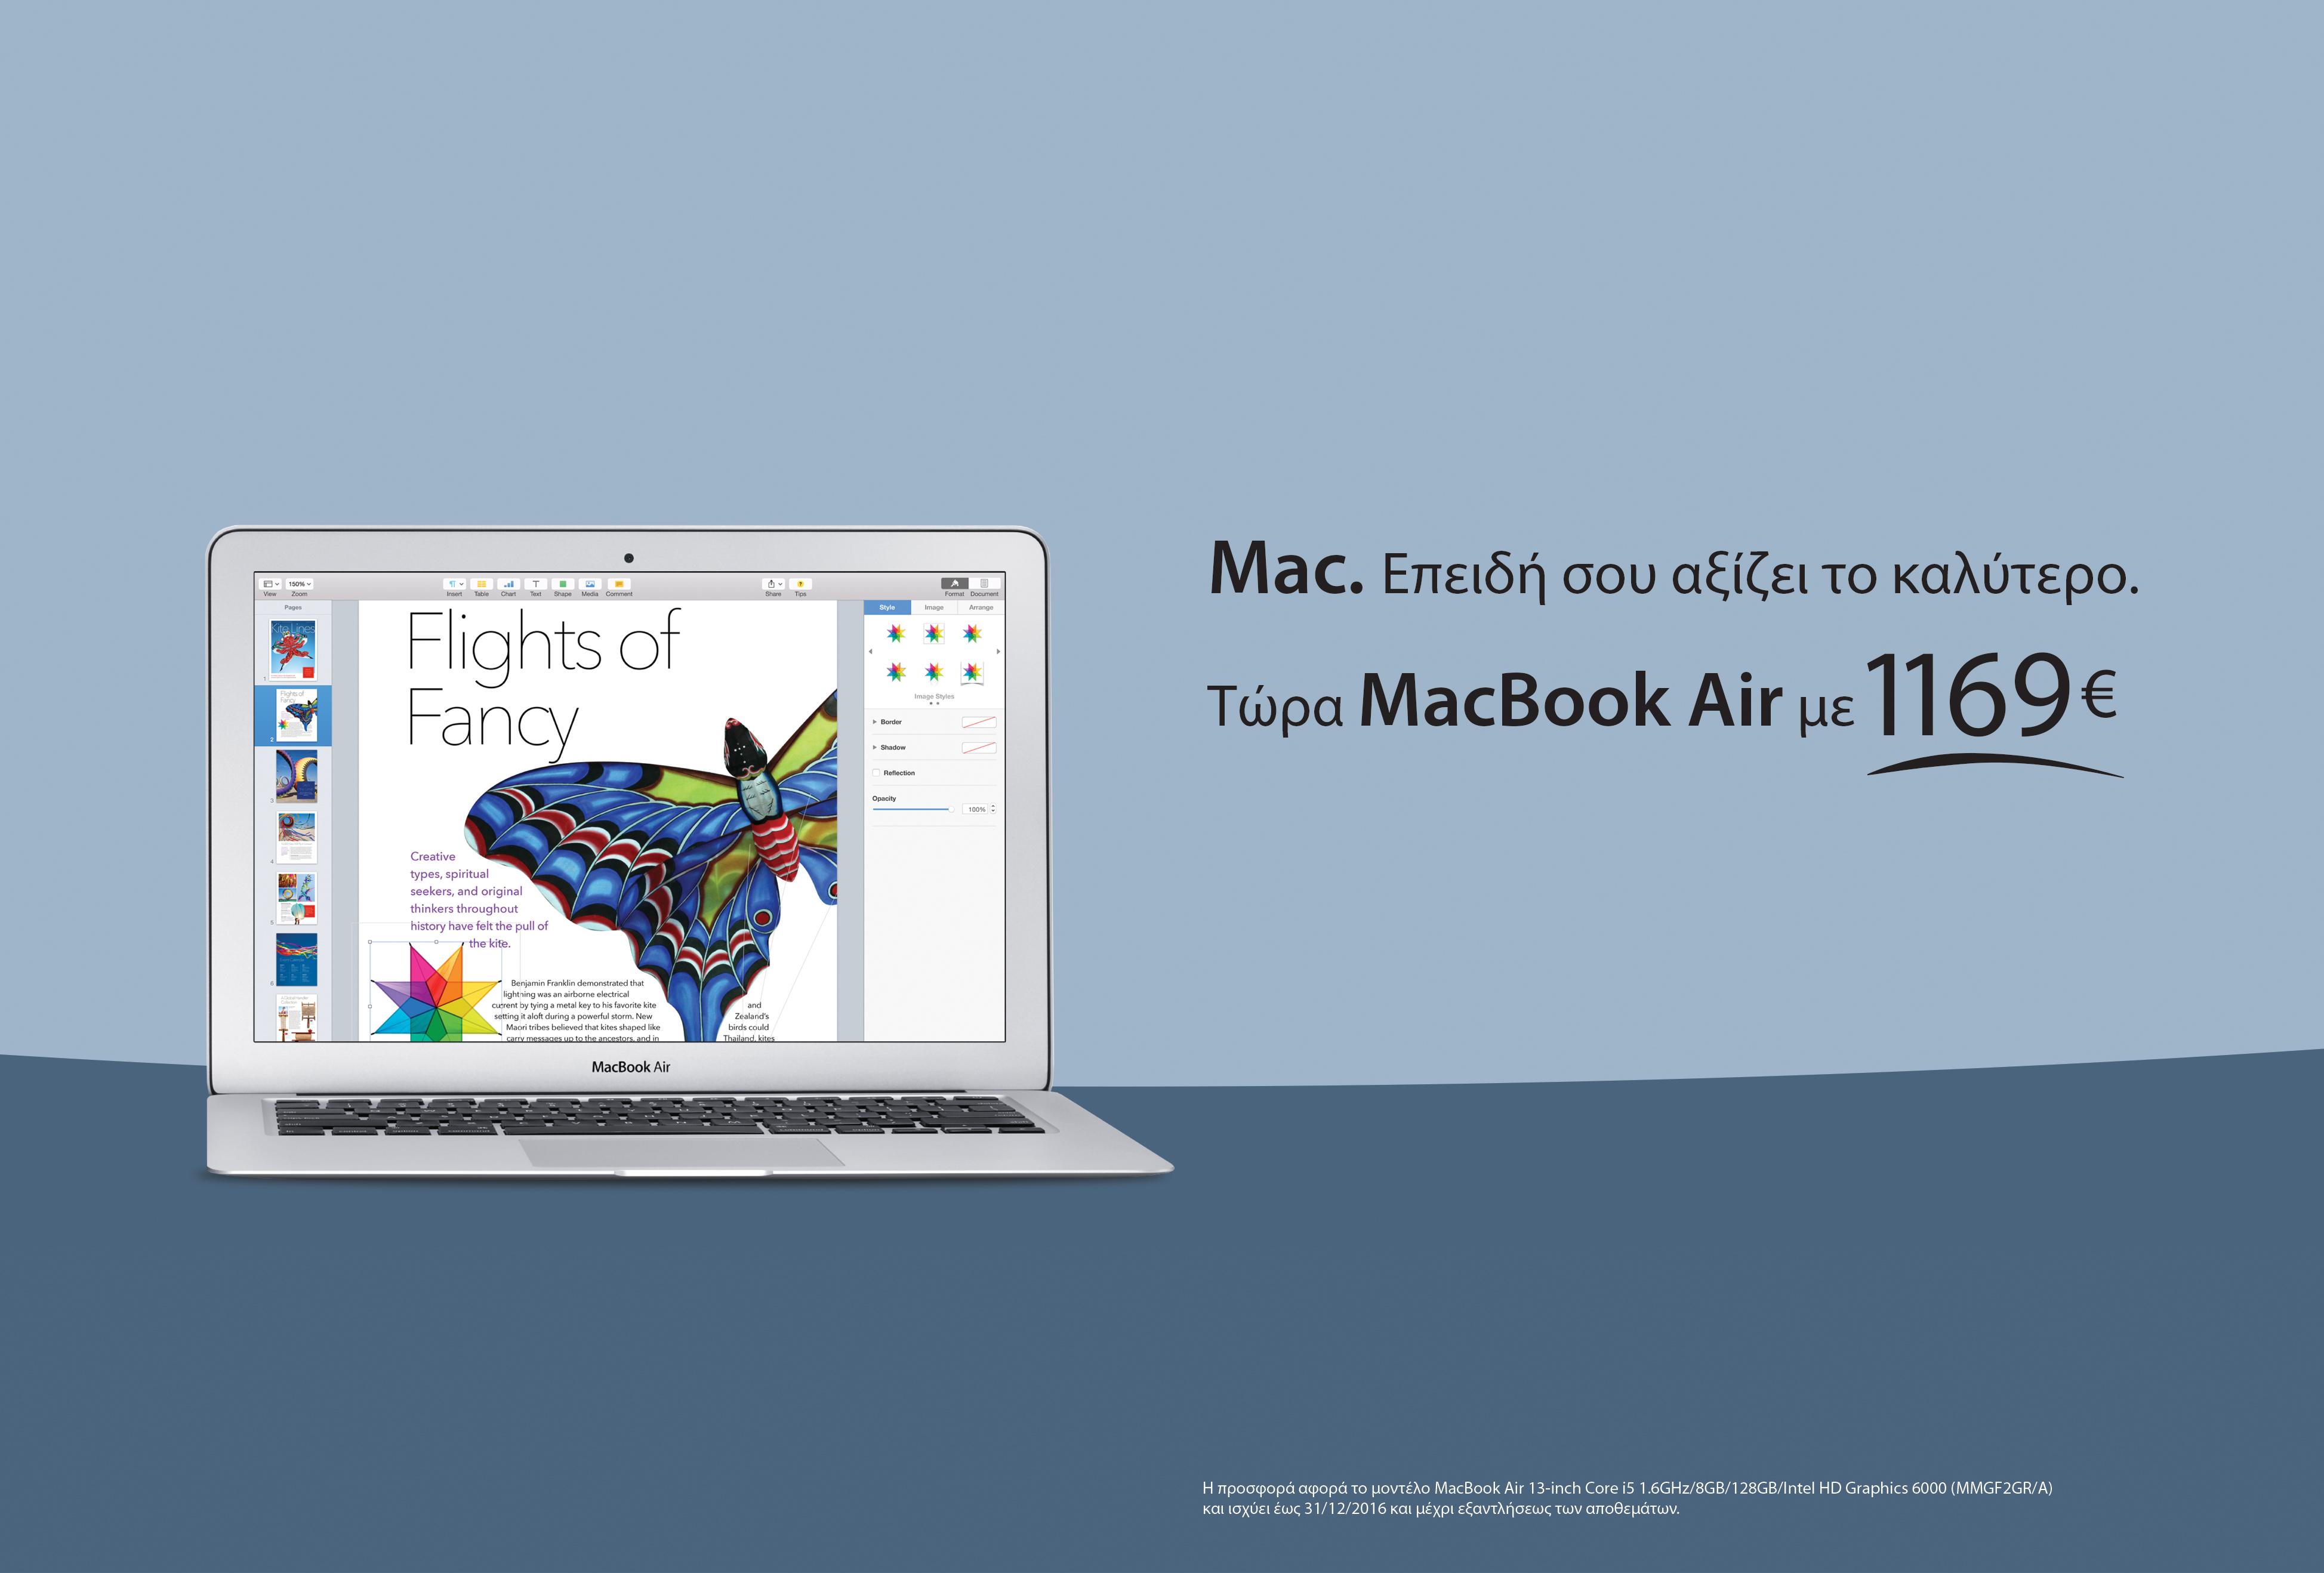 MacBook Air. Λεπτό, ελαφρύ, ισχυρό και τώρα σε νέα ελκυστική τιμή.